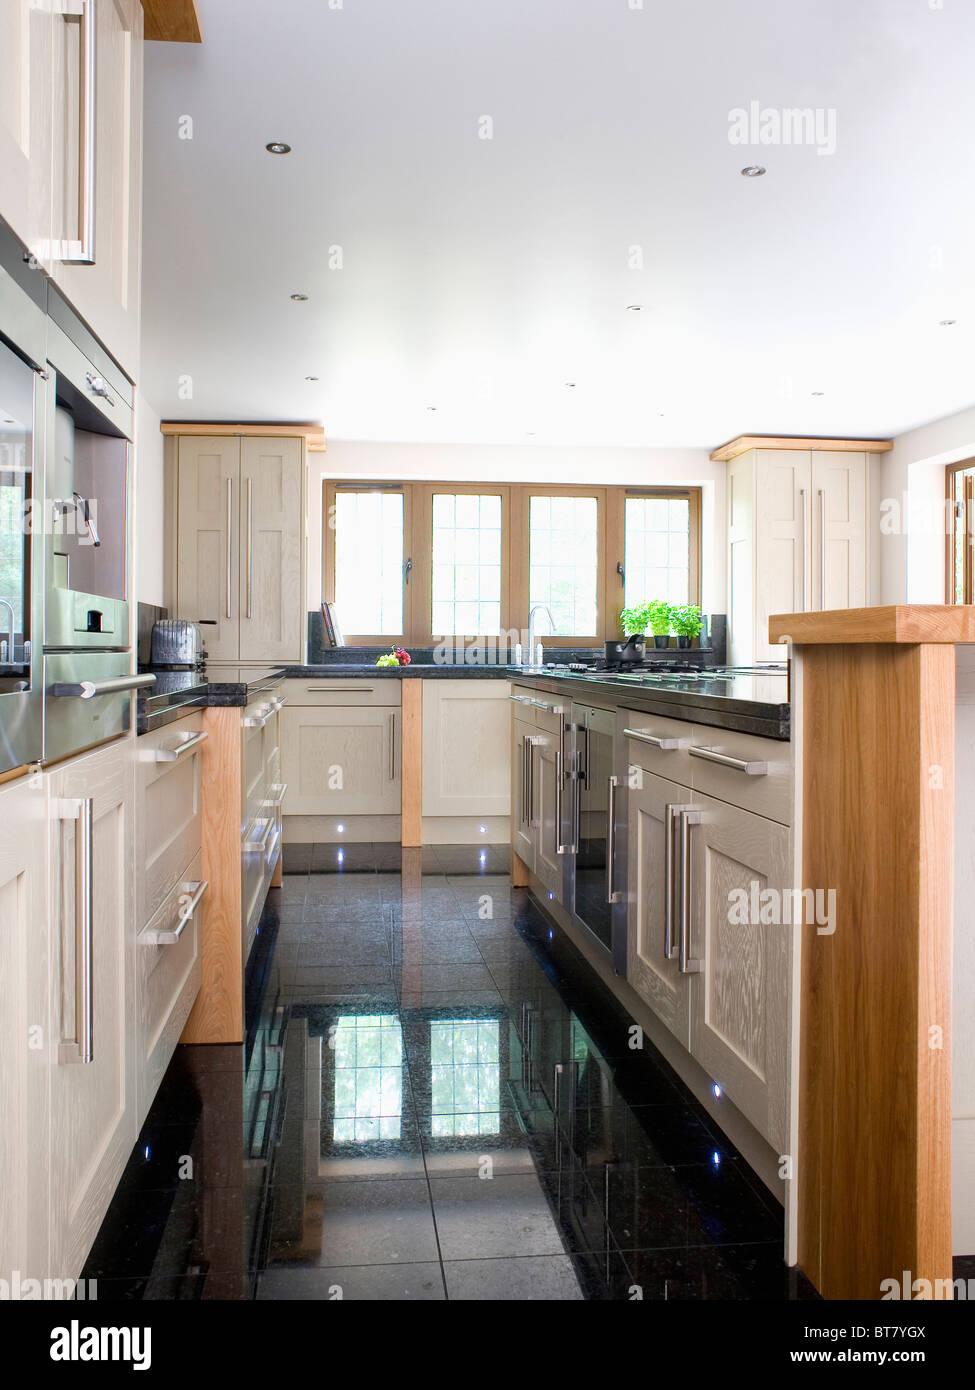 Black Granite Flooring In Large Modern Kitchen Extension Stock Photo Alamy